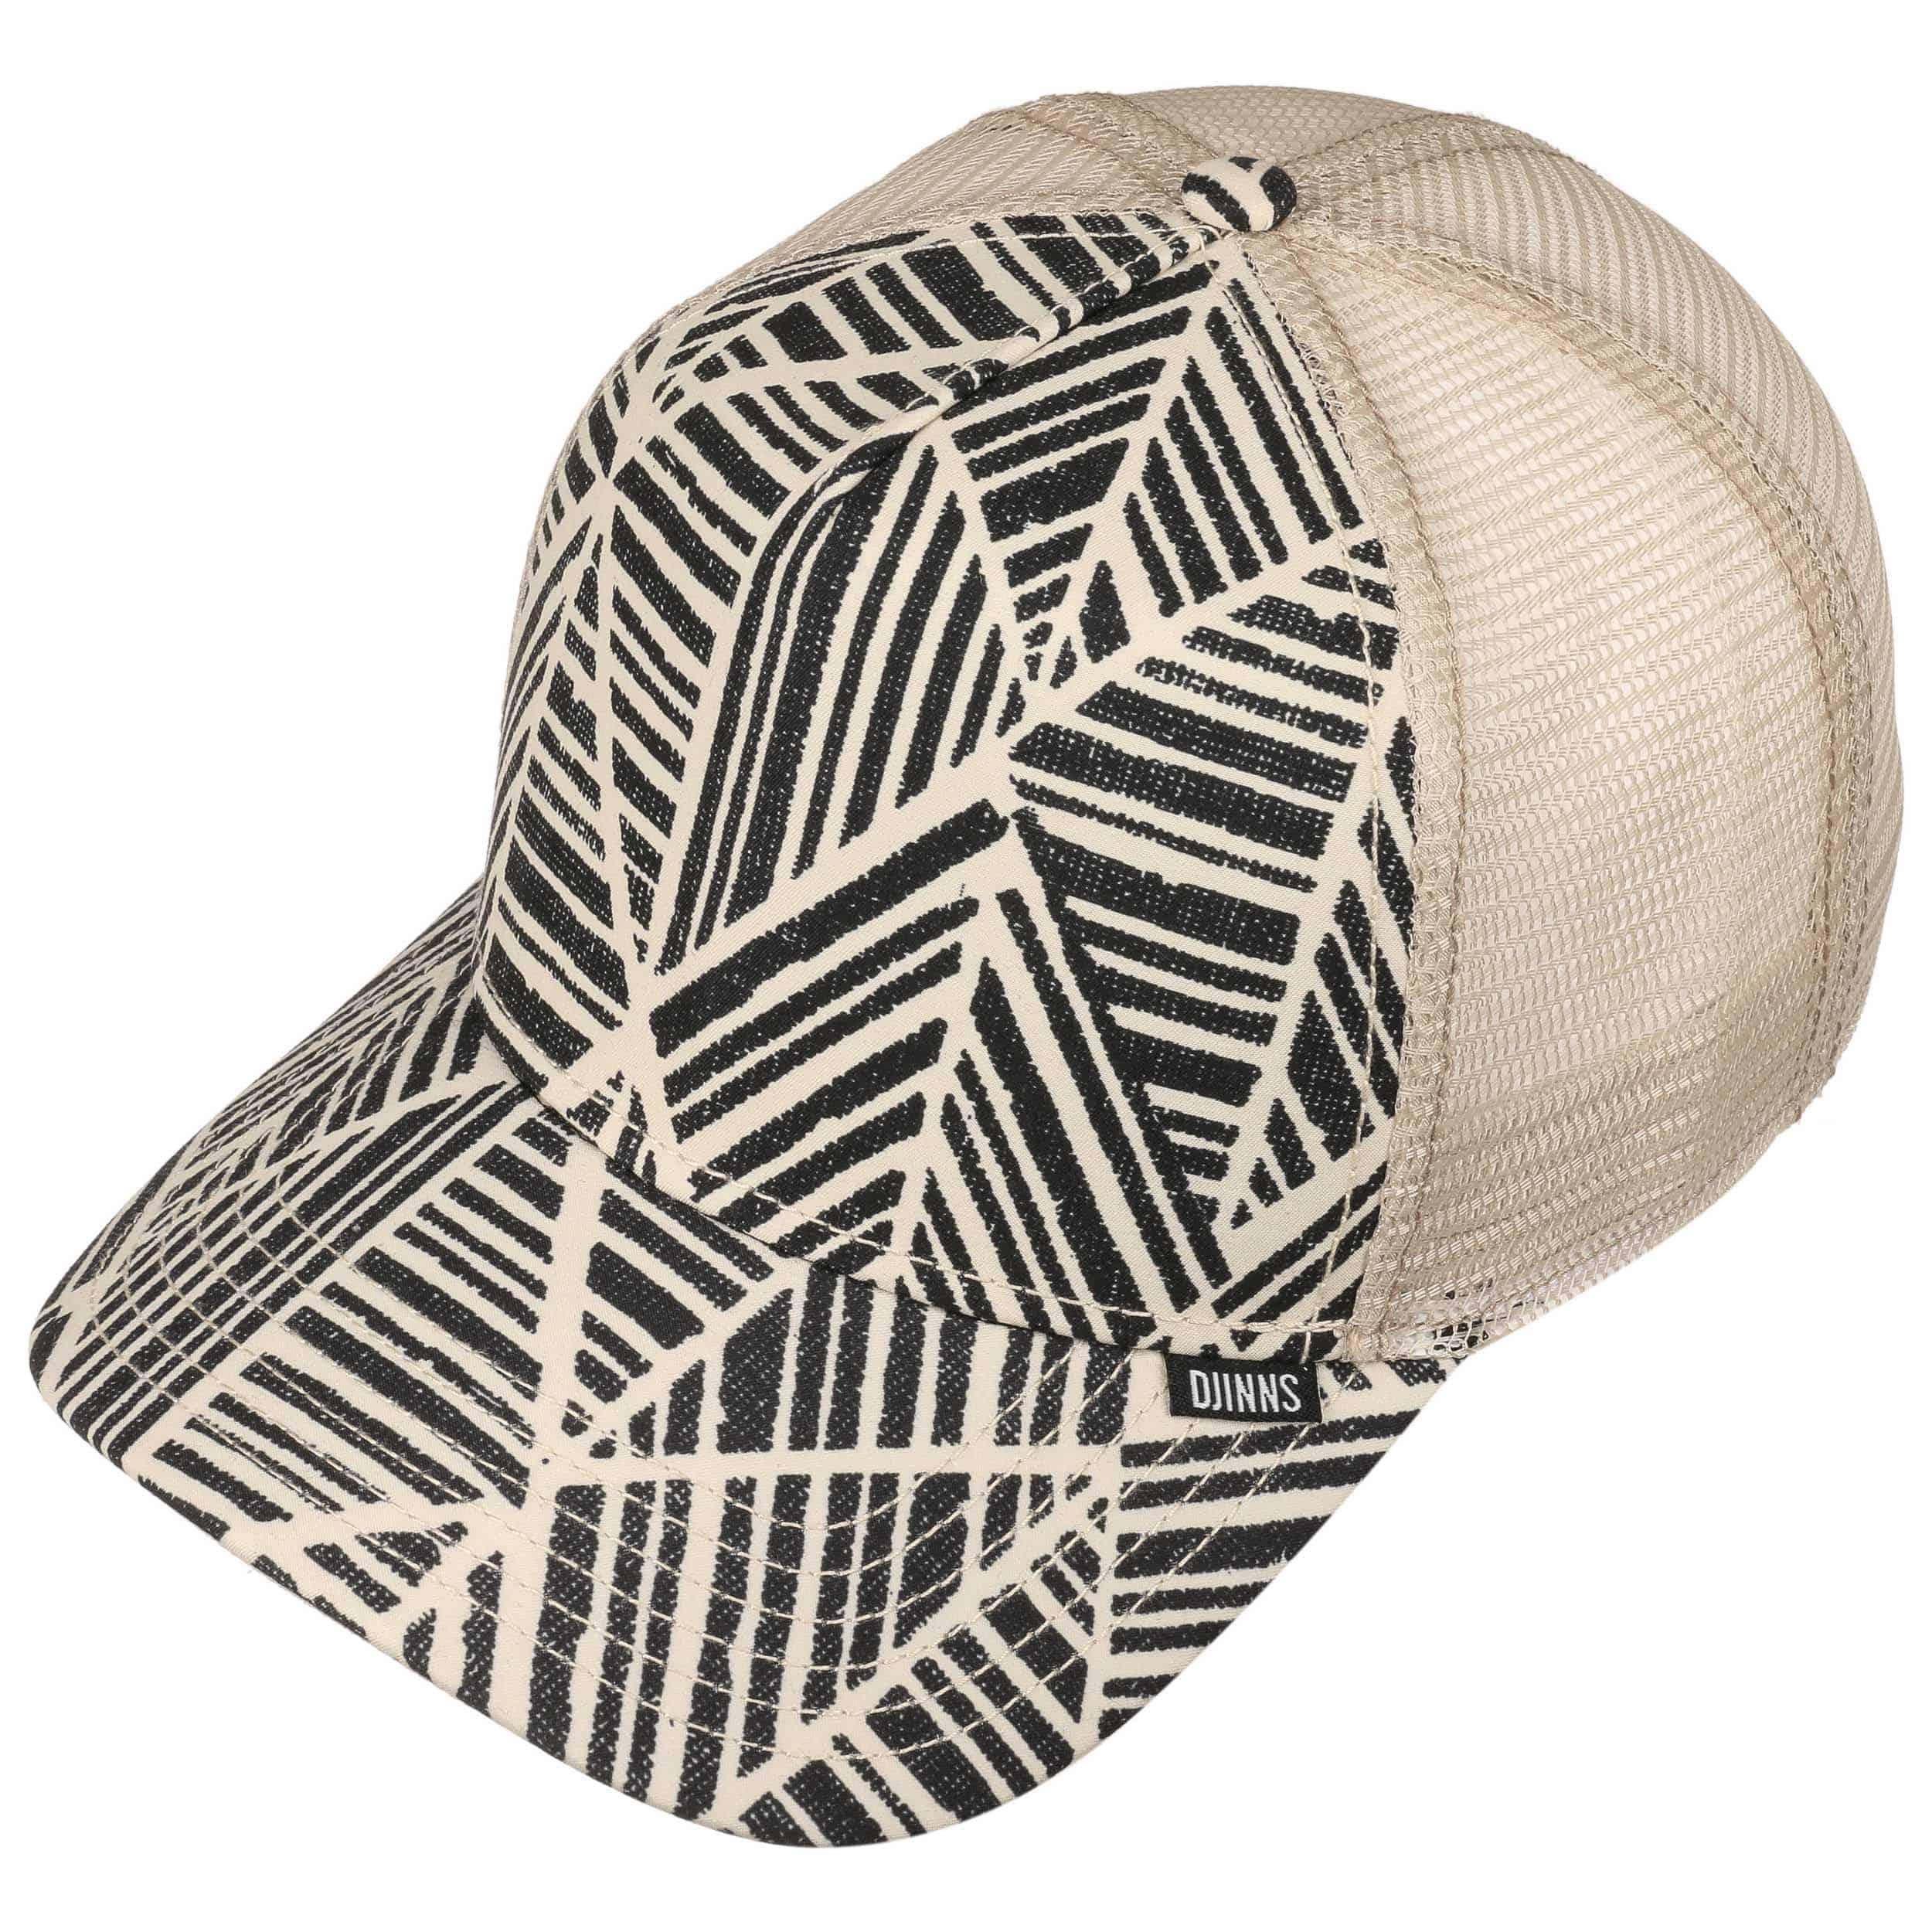 alopa hft trucker cap by djinns eur 24 95 hats caps. Black Bedroom Furniture Sets. Home Design Ideas